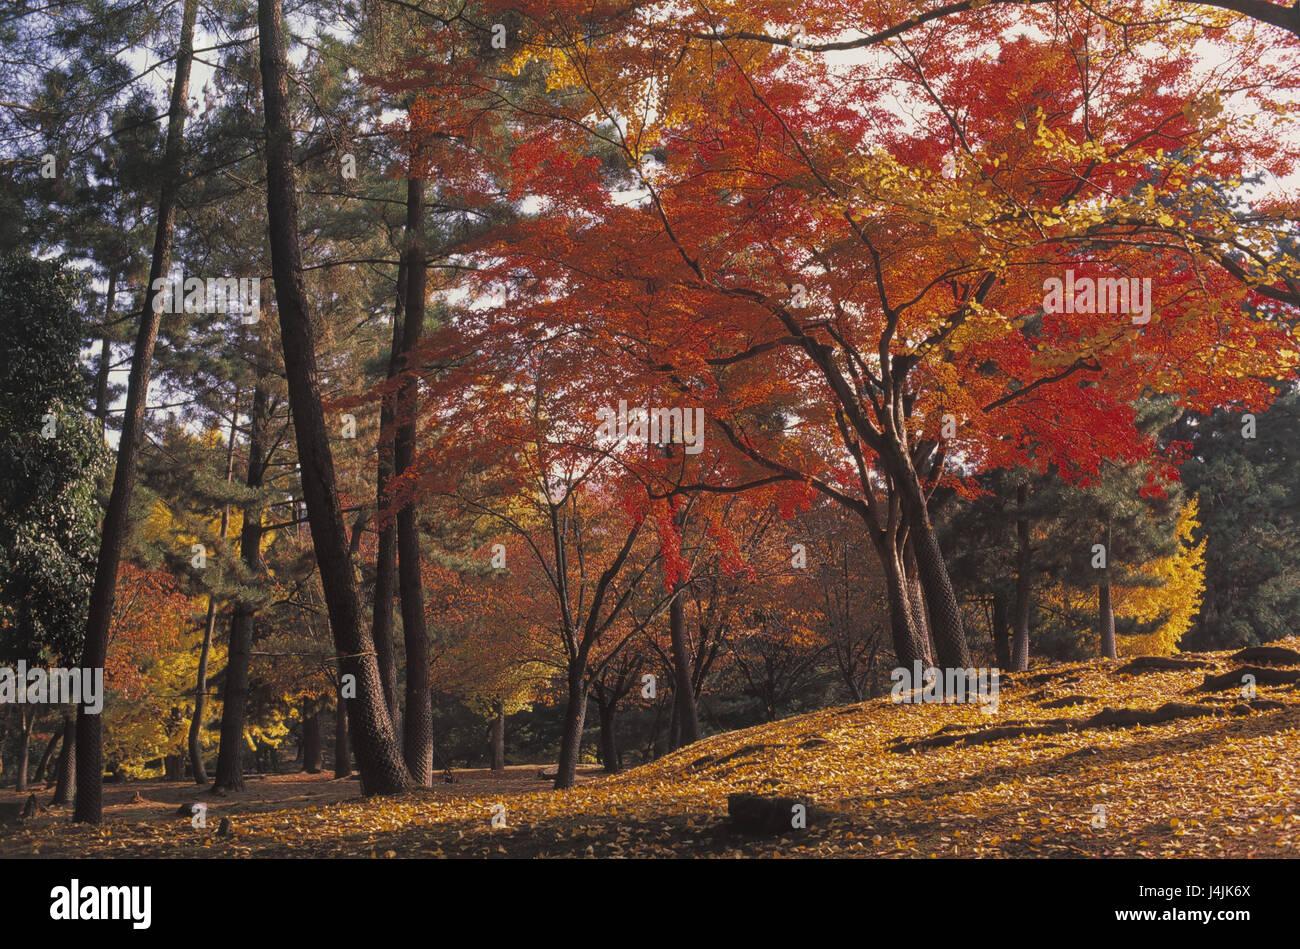 Japan, Nara, autumn wood Asia, Eastern Asia, island state, Nippon, Nihon Koku, Honshu, wood, plants, trees, broad Stock Photo